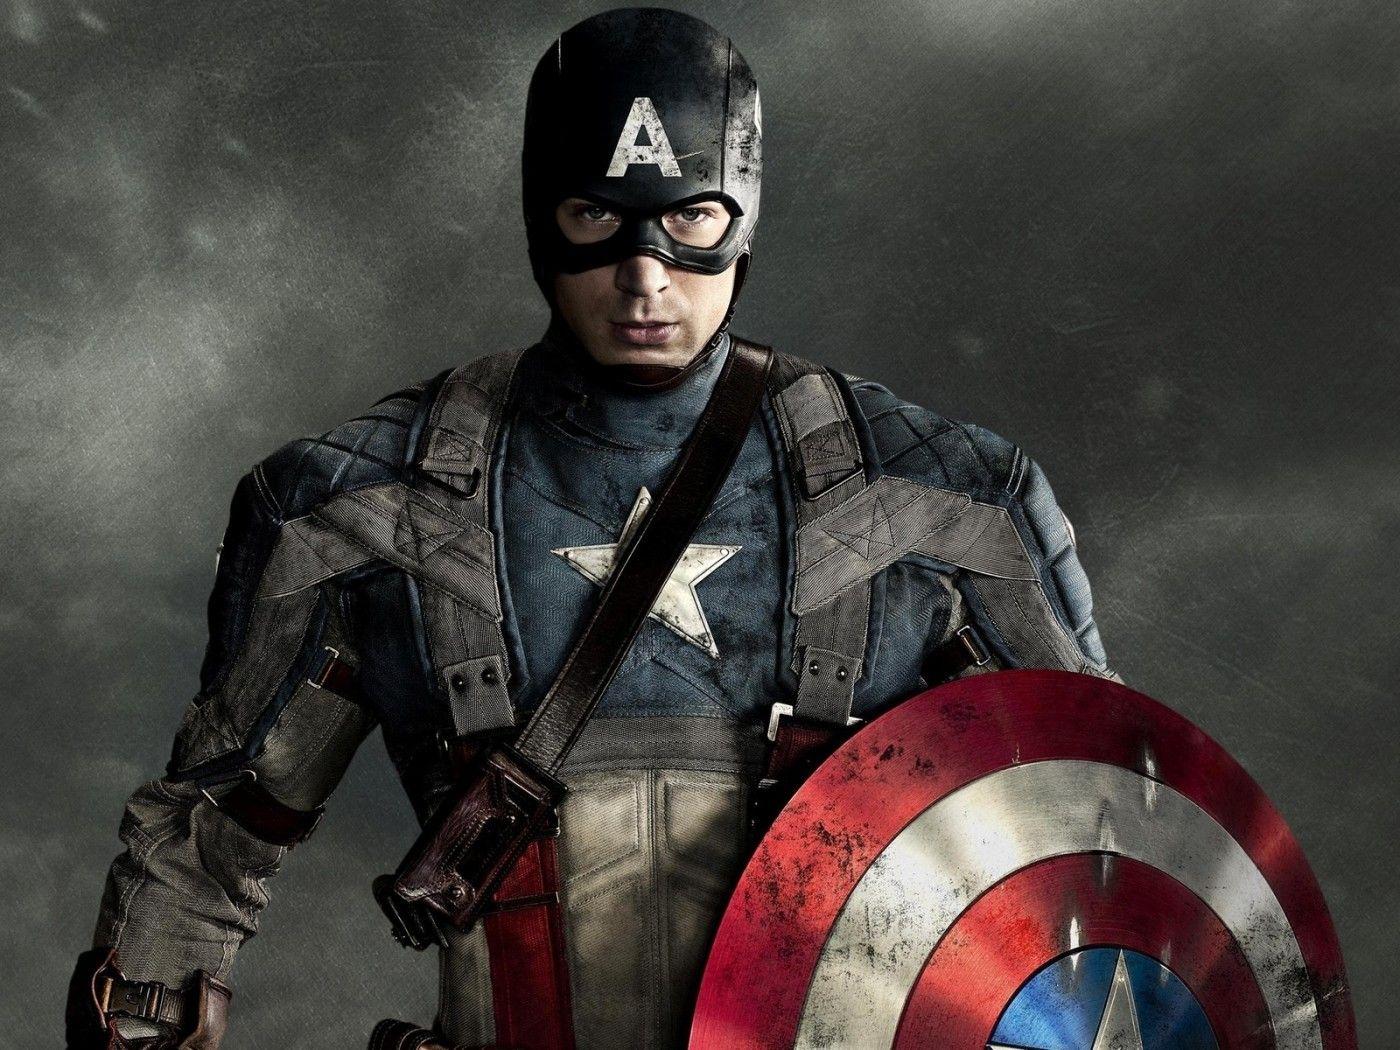 Canal de Cine FEDERICO CASADO: ¿Han despedido al Capitán América ...